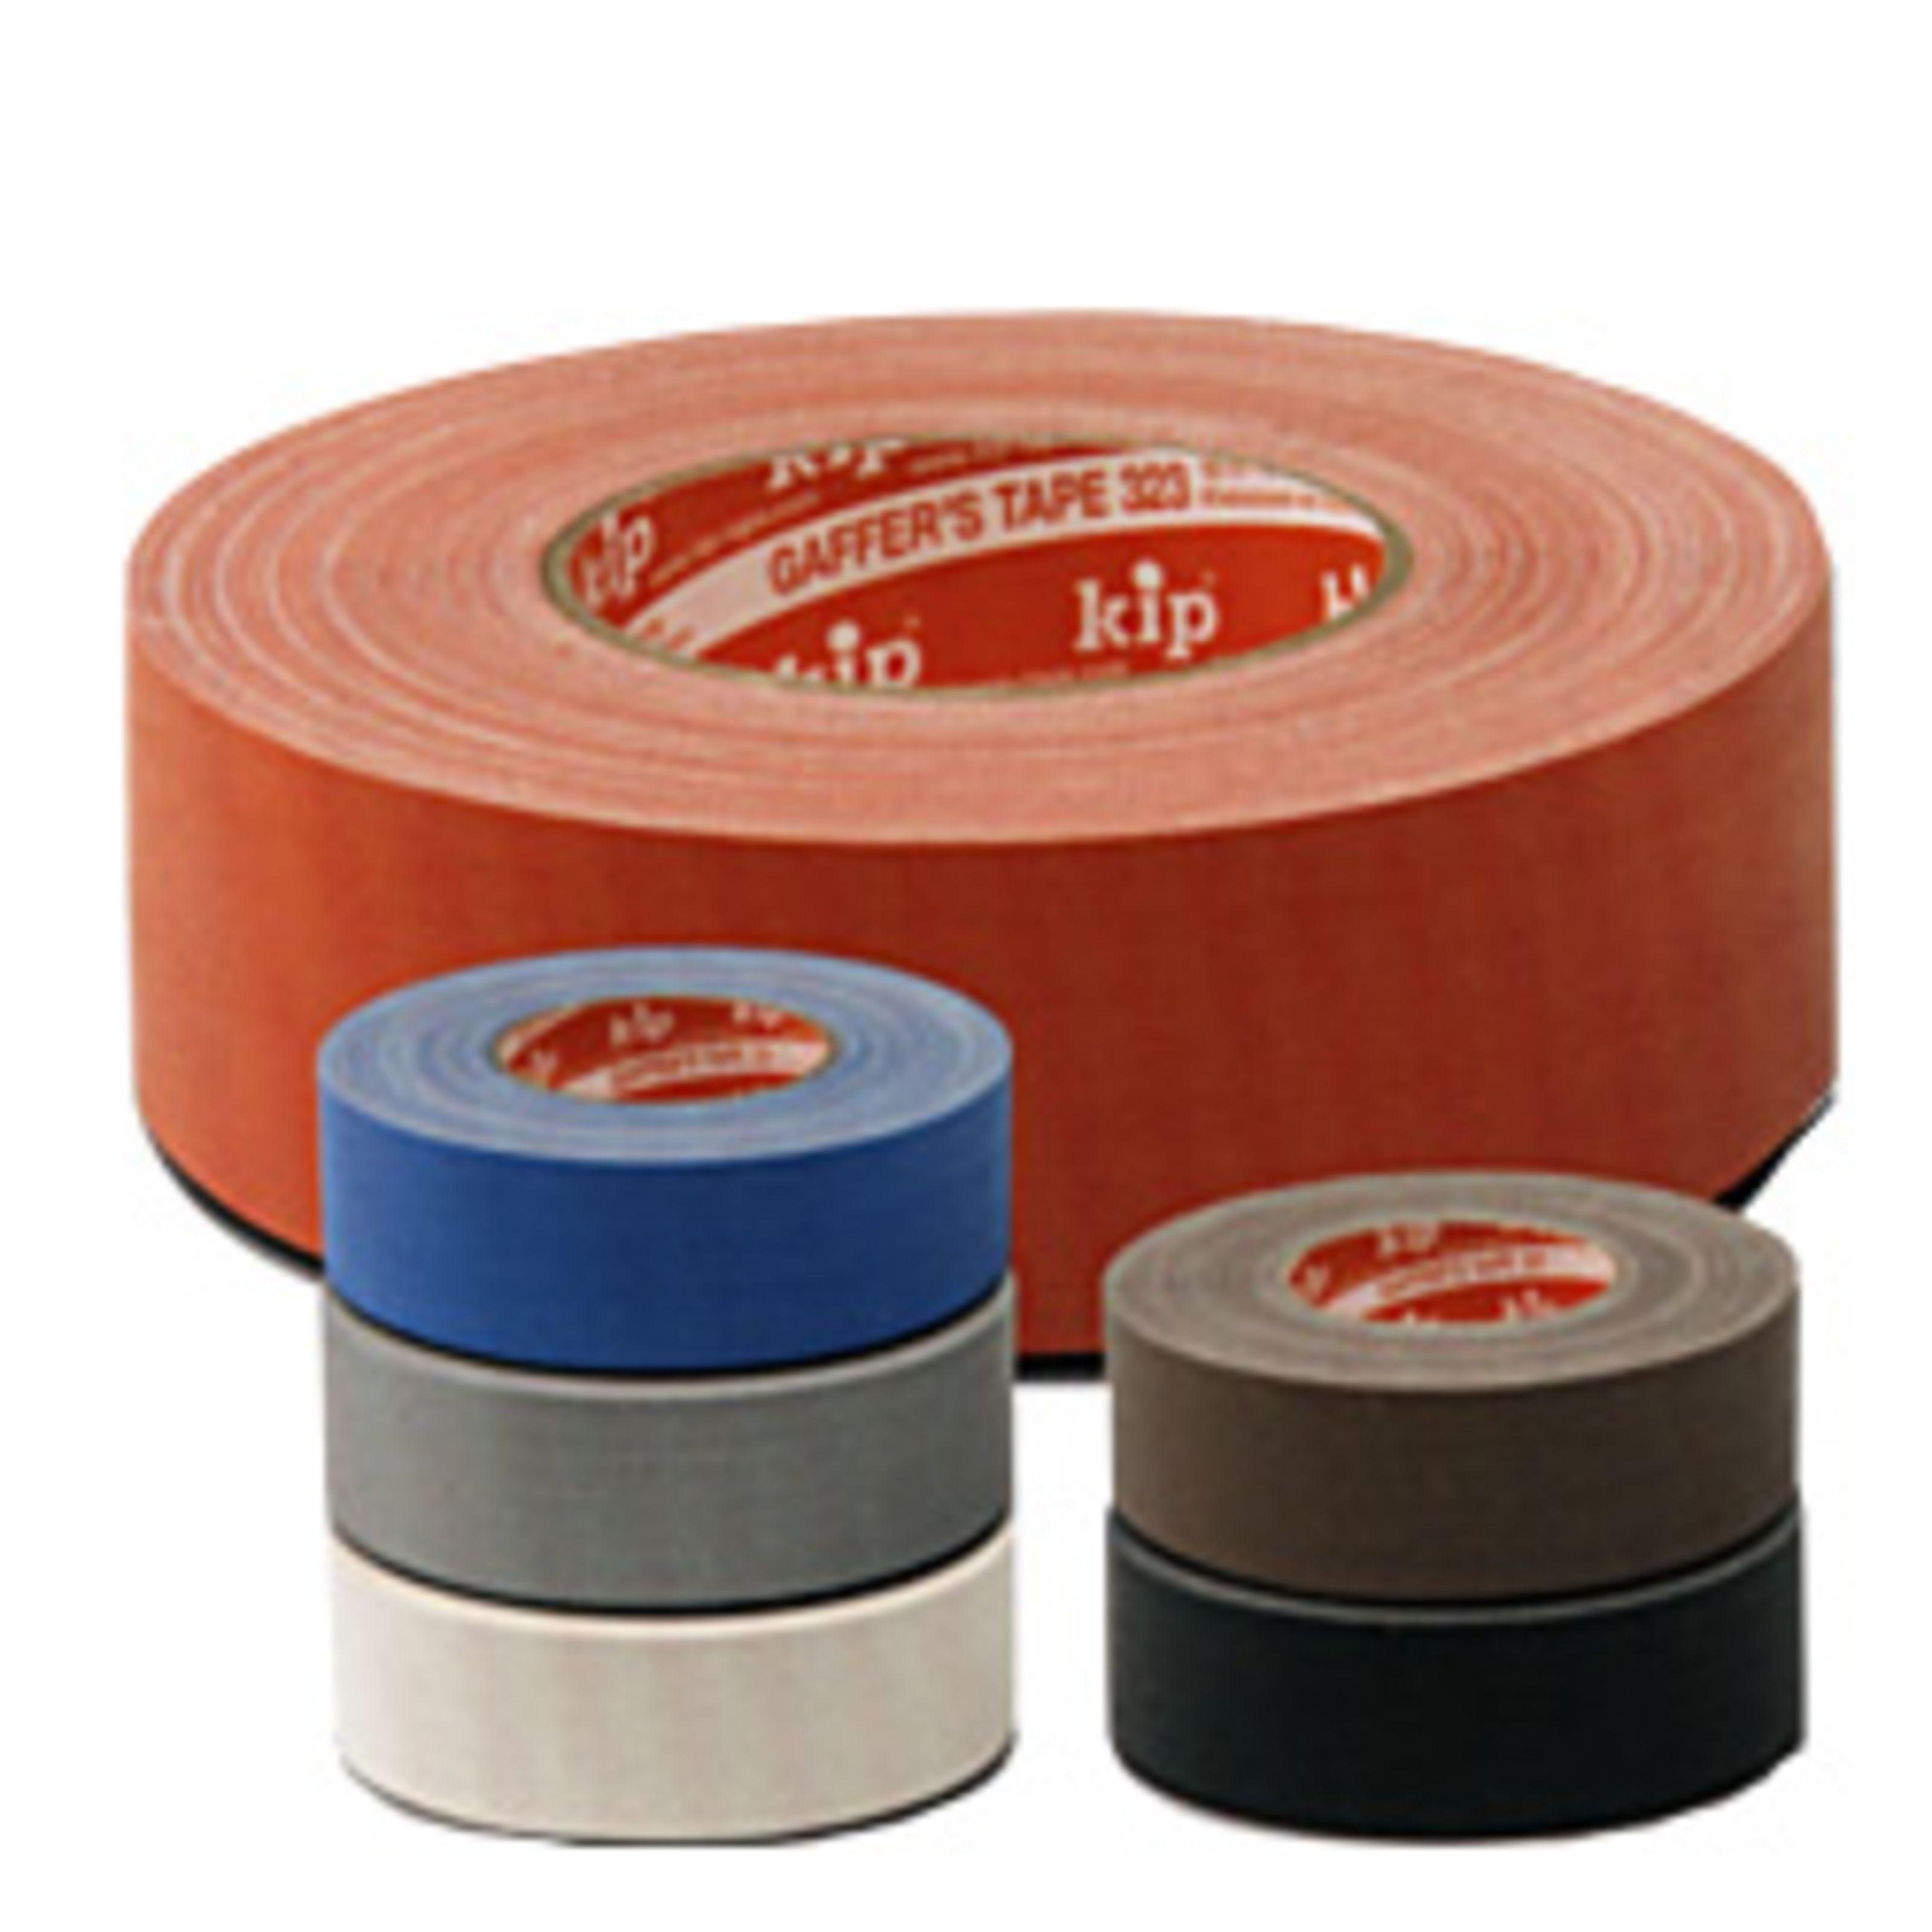 kip Klebebänder - 323 Gaffer's Tape grau 323-45